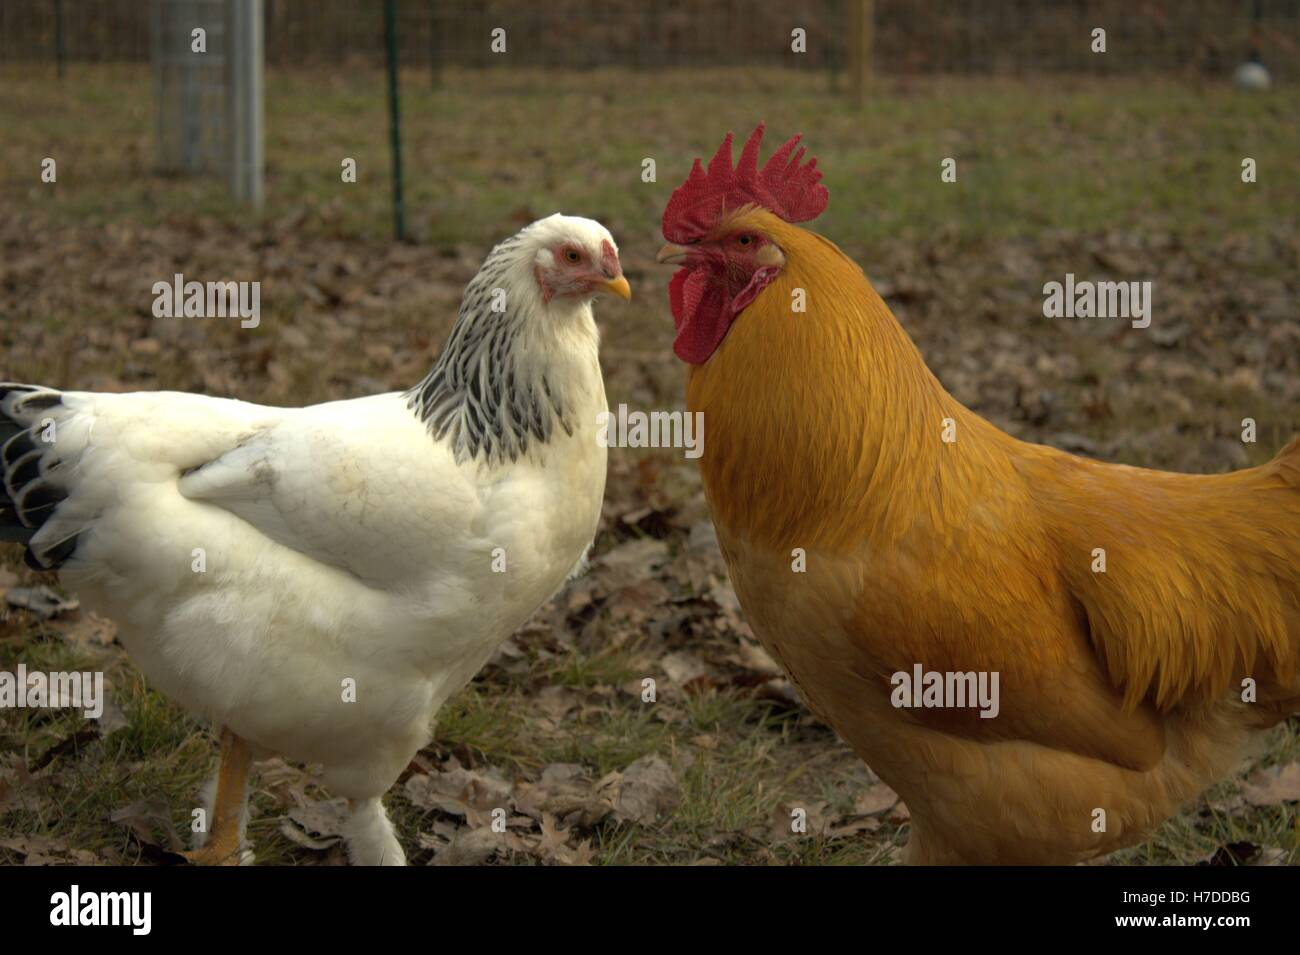 Luce di Brahma gallina e Buff Orpington Rooster, faccia a faccia Immagini Stock